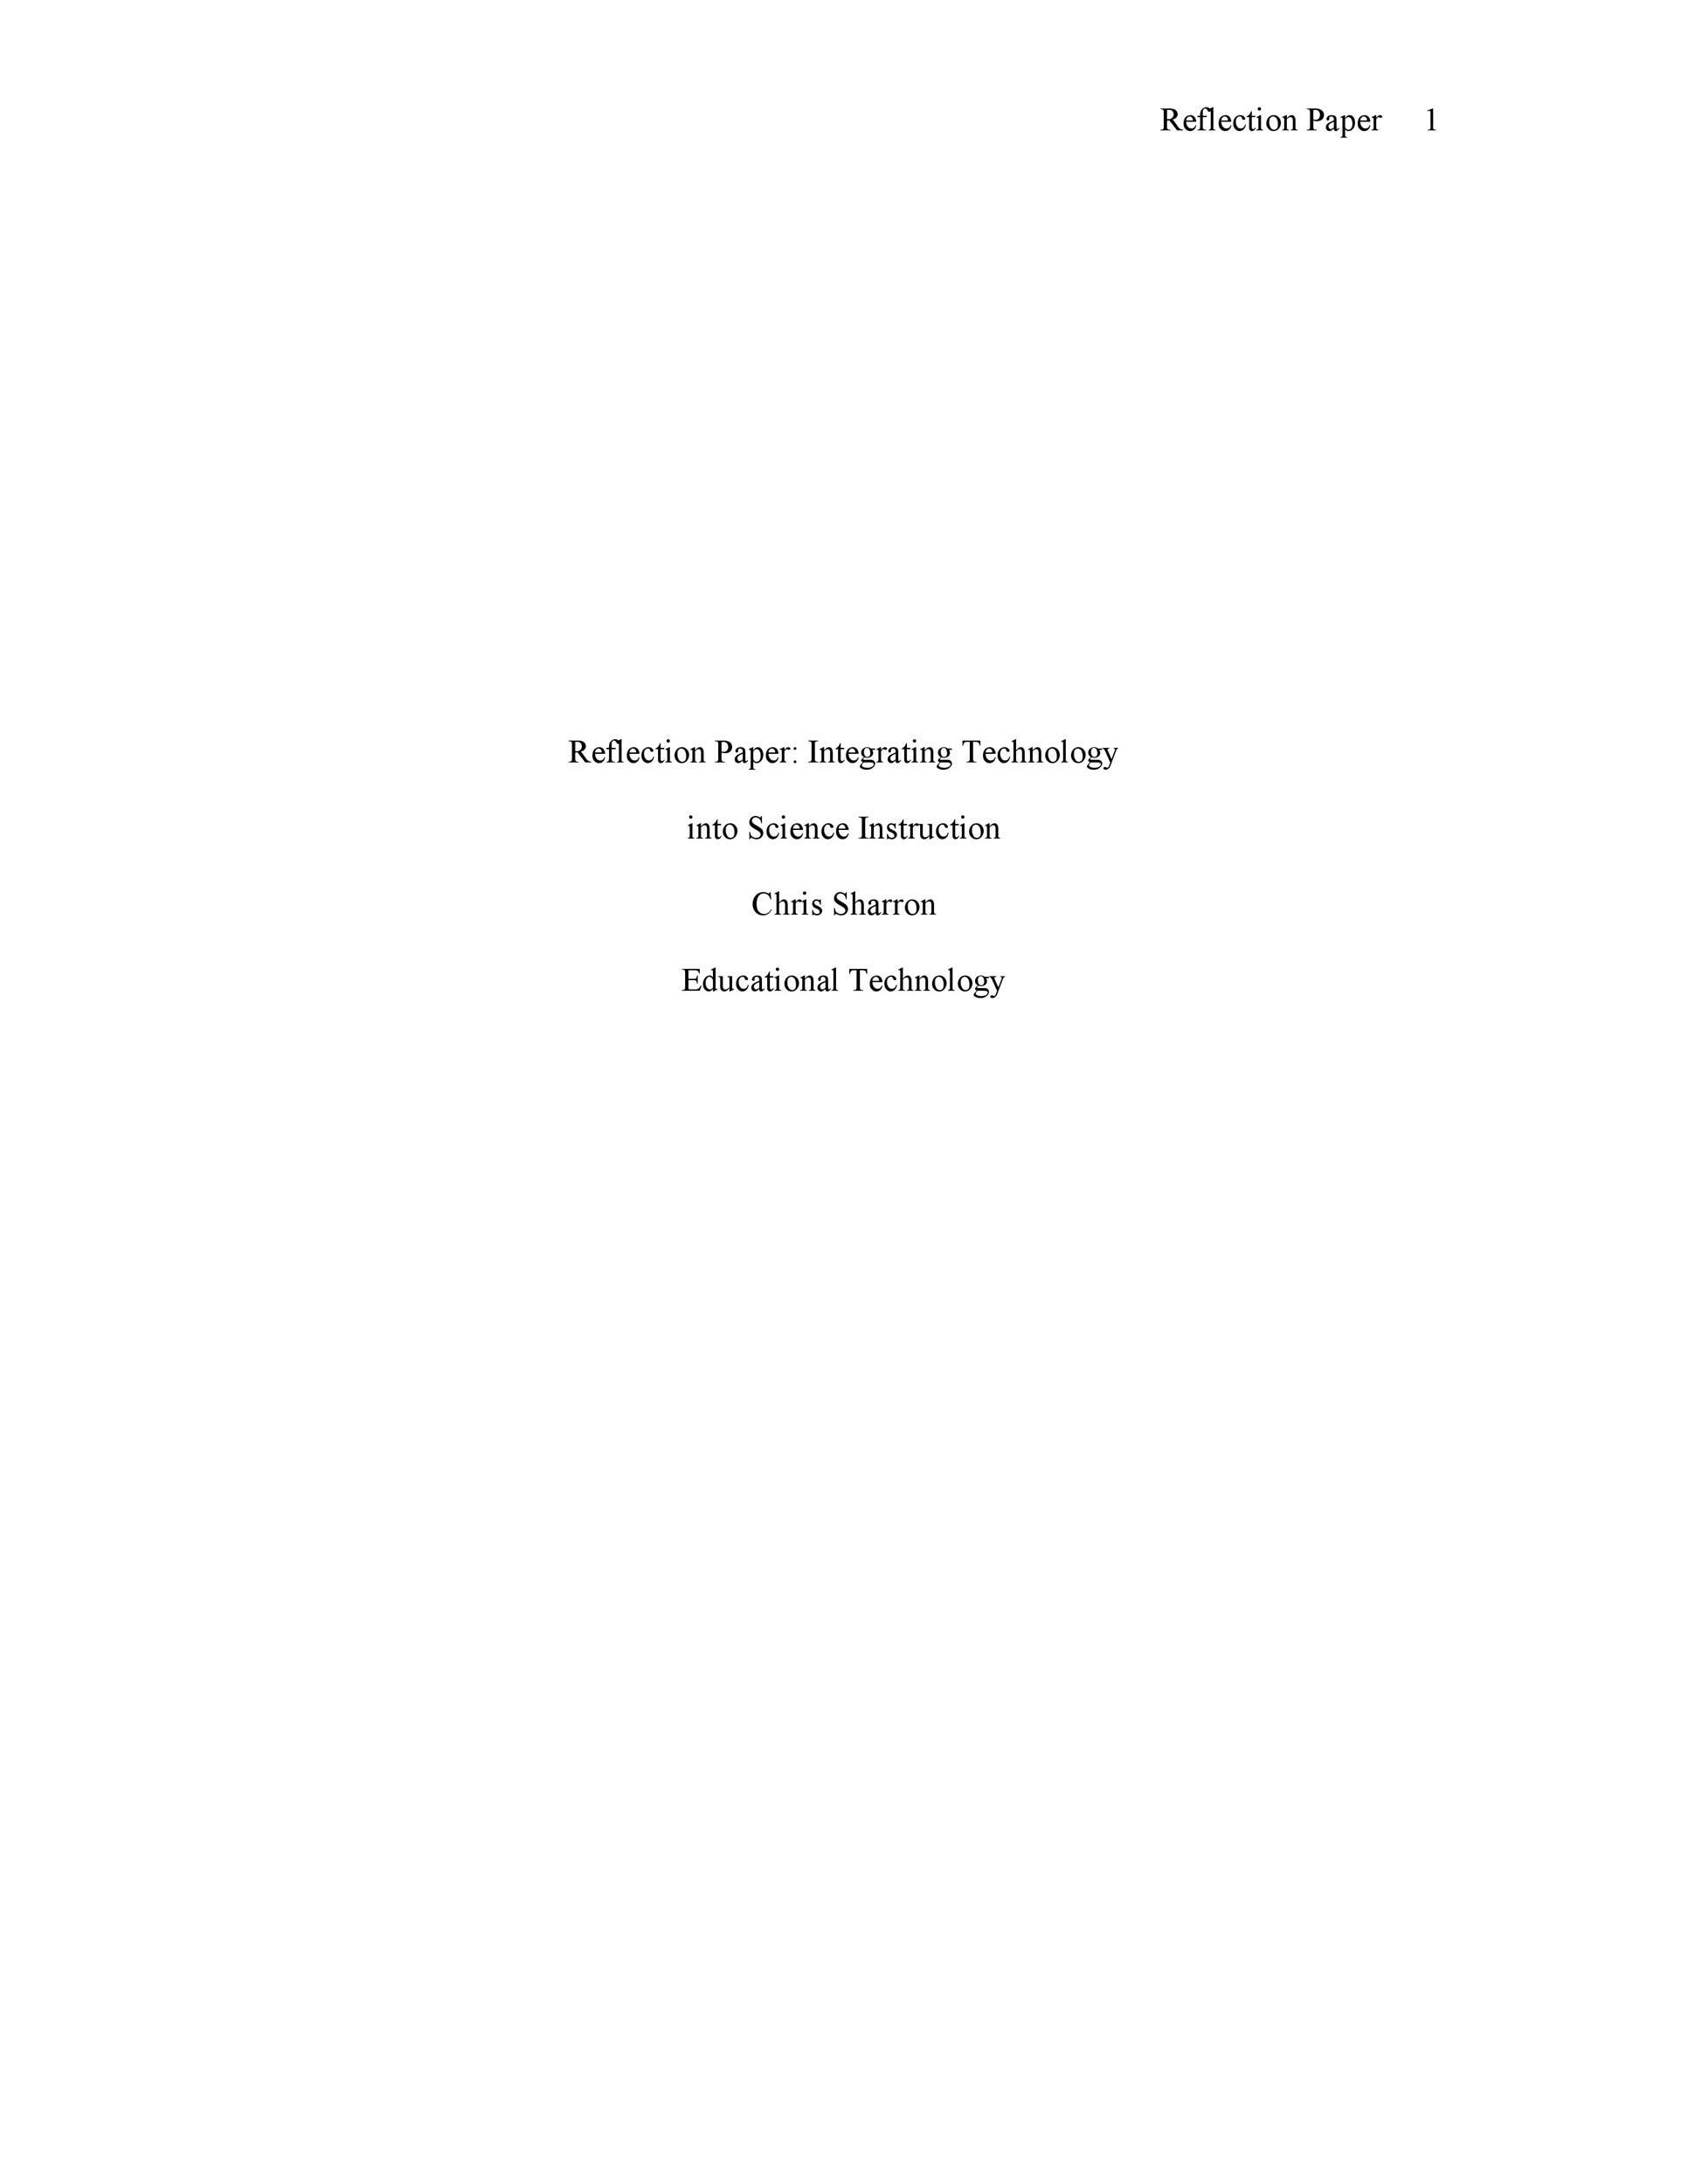 Free reflective essay example 40